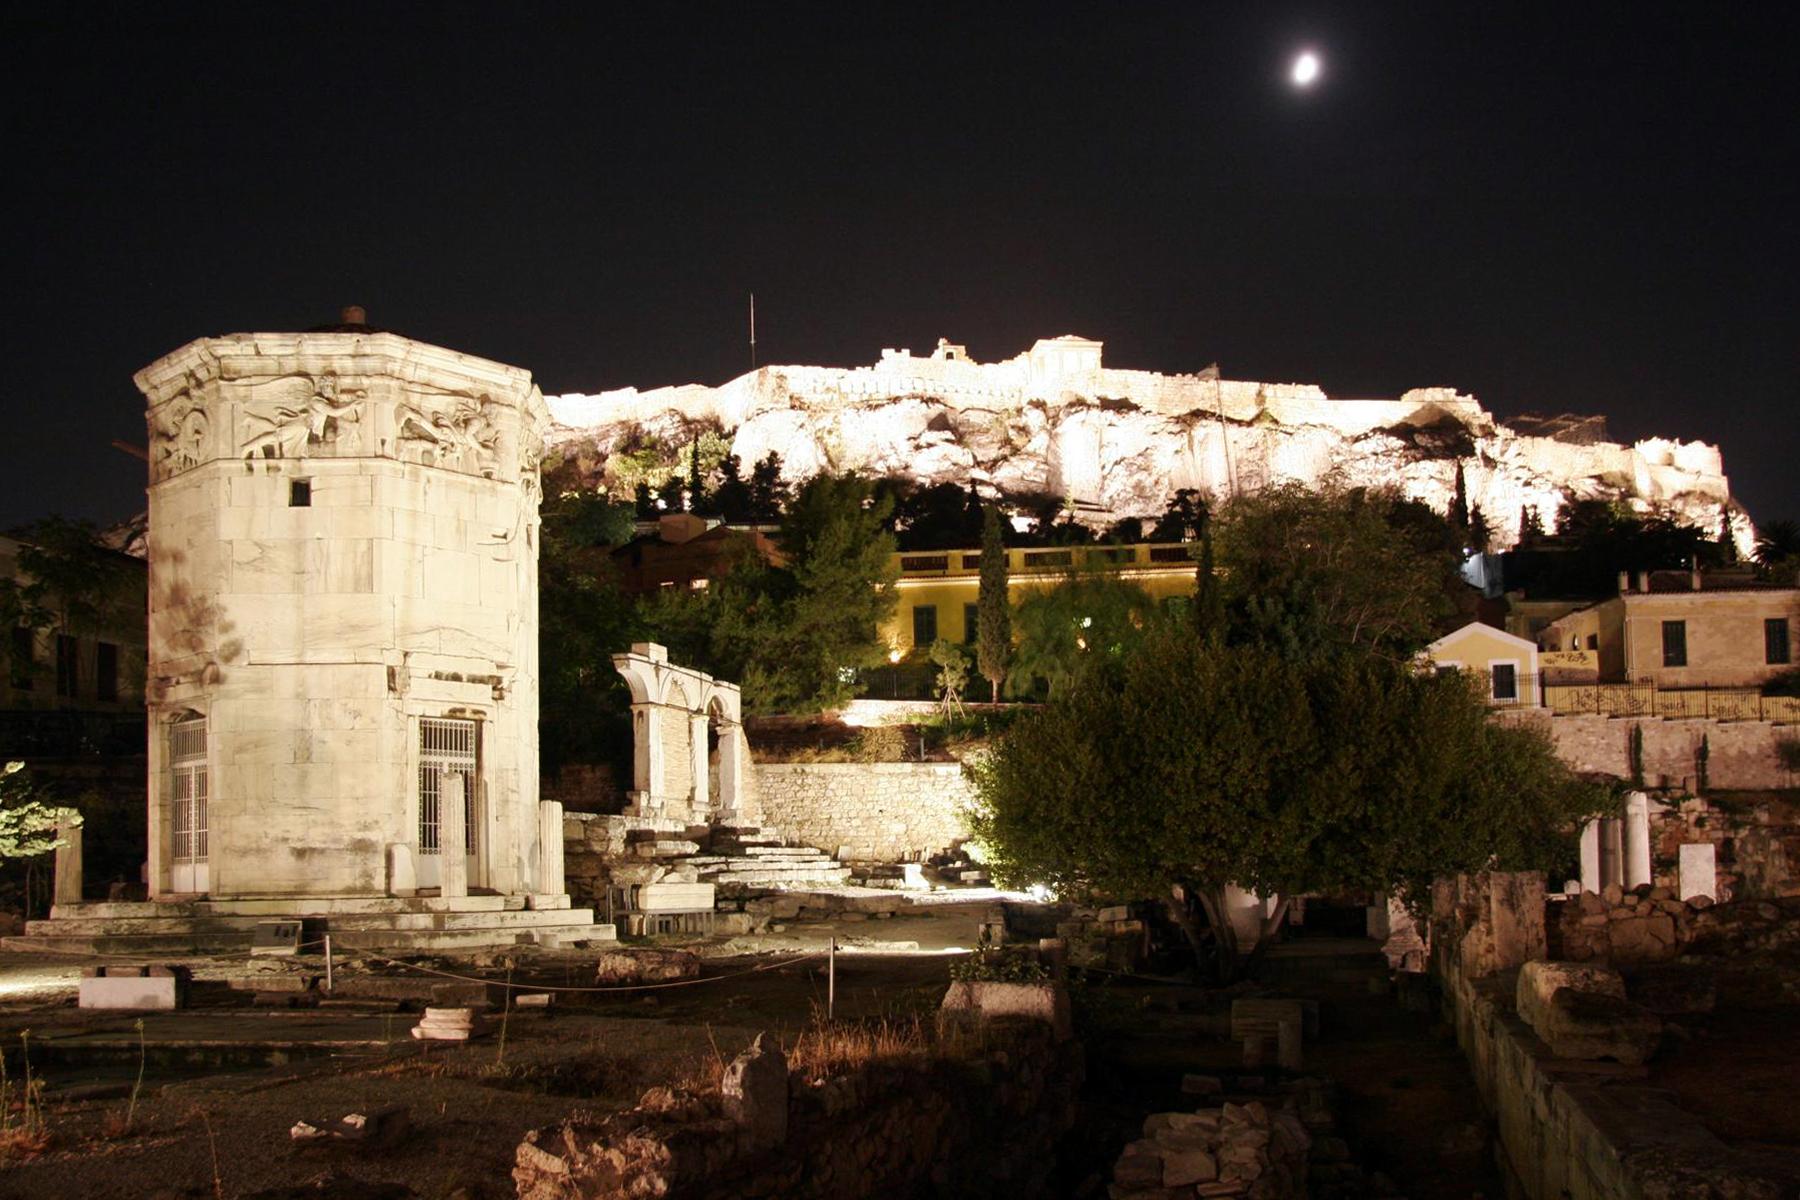 beleuchtete Akropolis, links der Turm der Winde